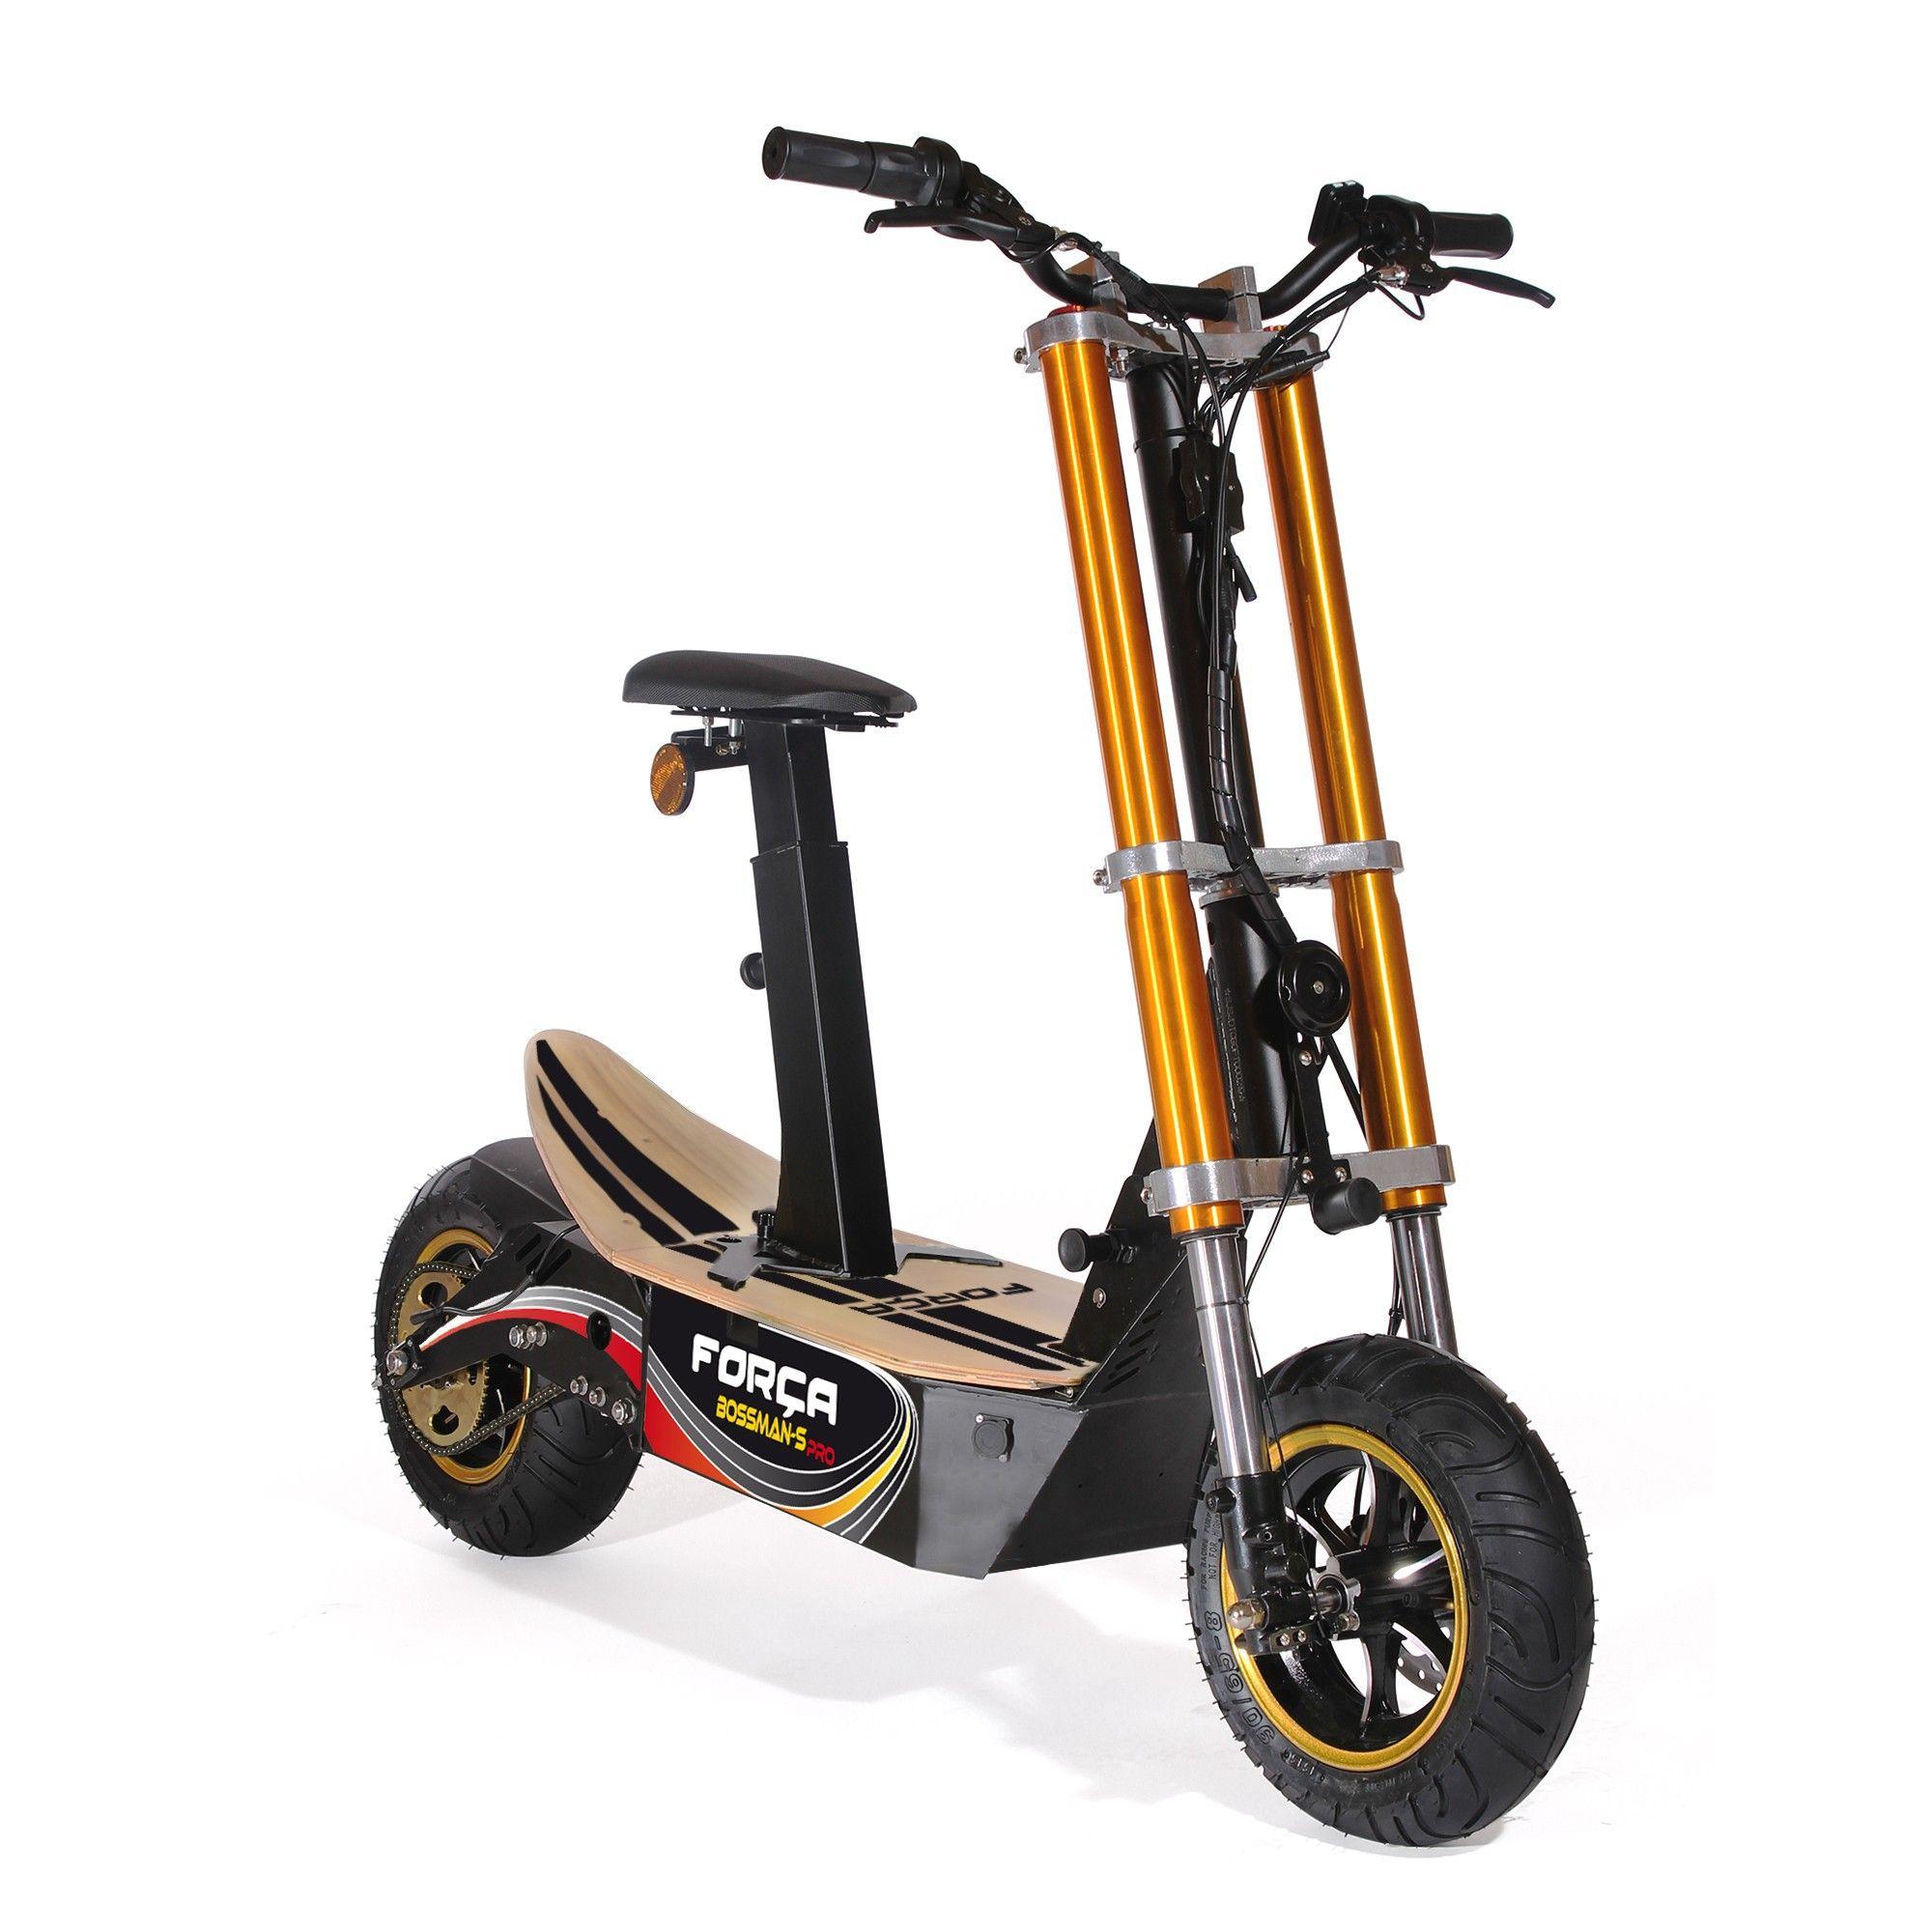 Forca Bossman S Elektro Scooter Mit 18ah Bleigel Akku 48 V 1500 W Strassenzulassung Eec 45km H Topspeed In Schwarz Gold Elektroroller Elektro Scooter Roller